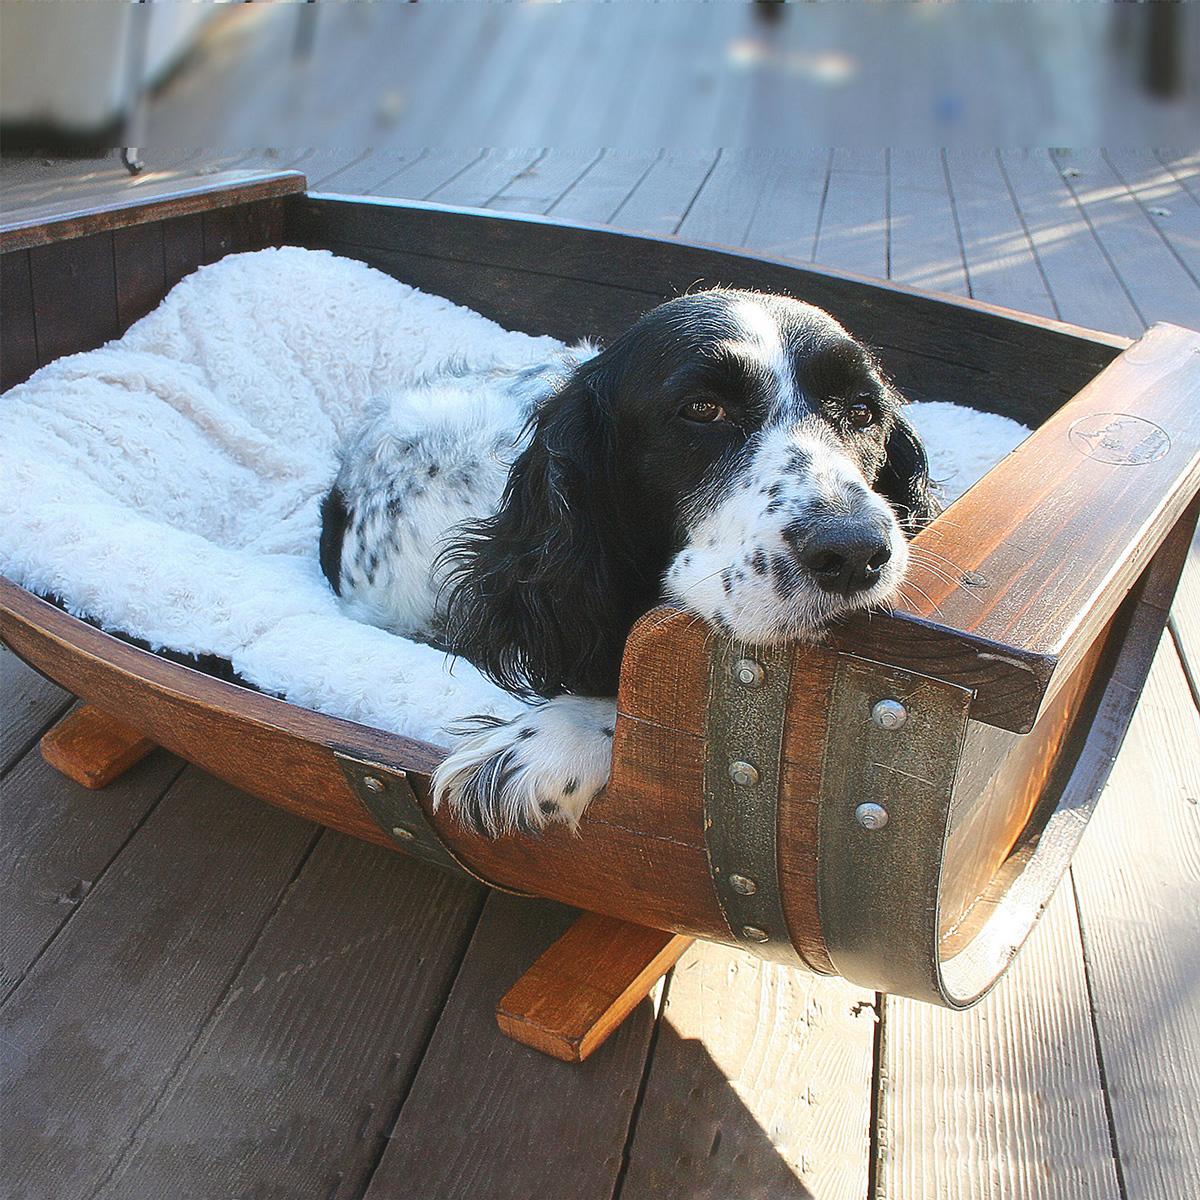 vp-barril-dog